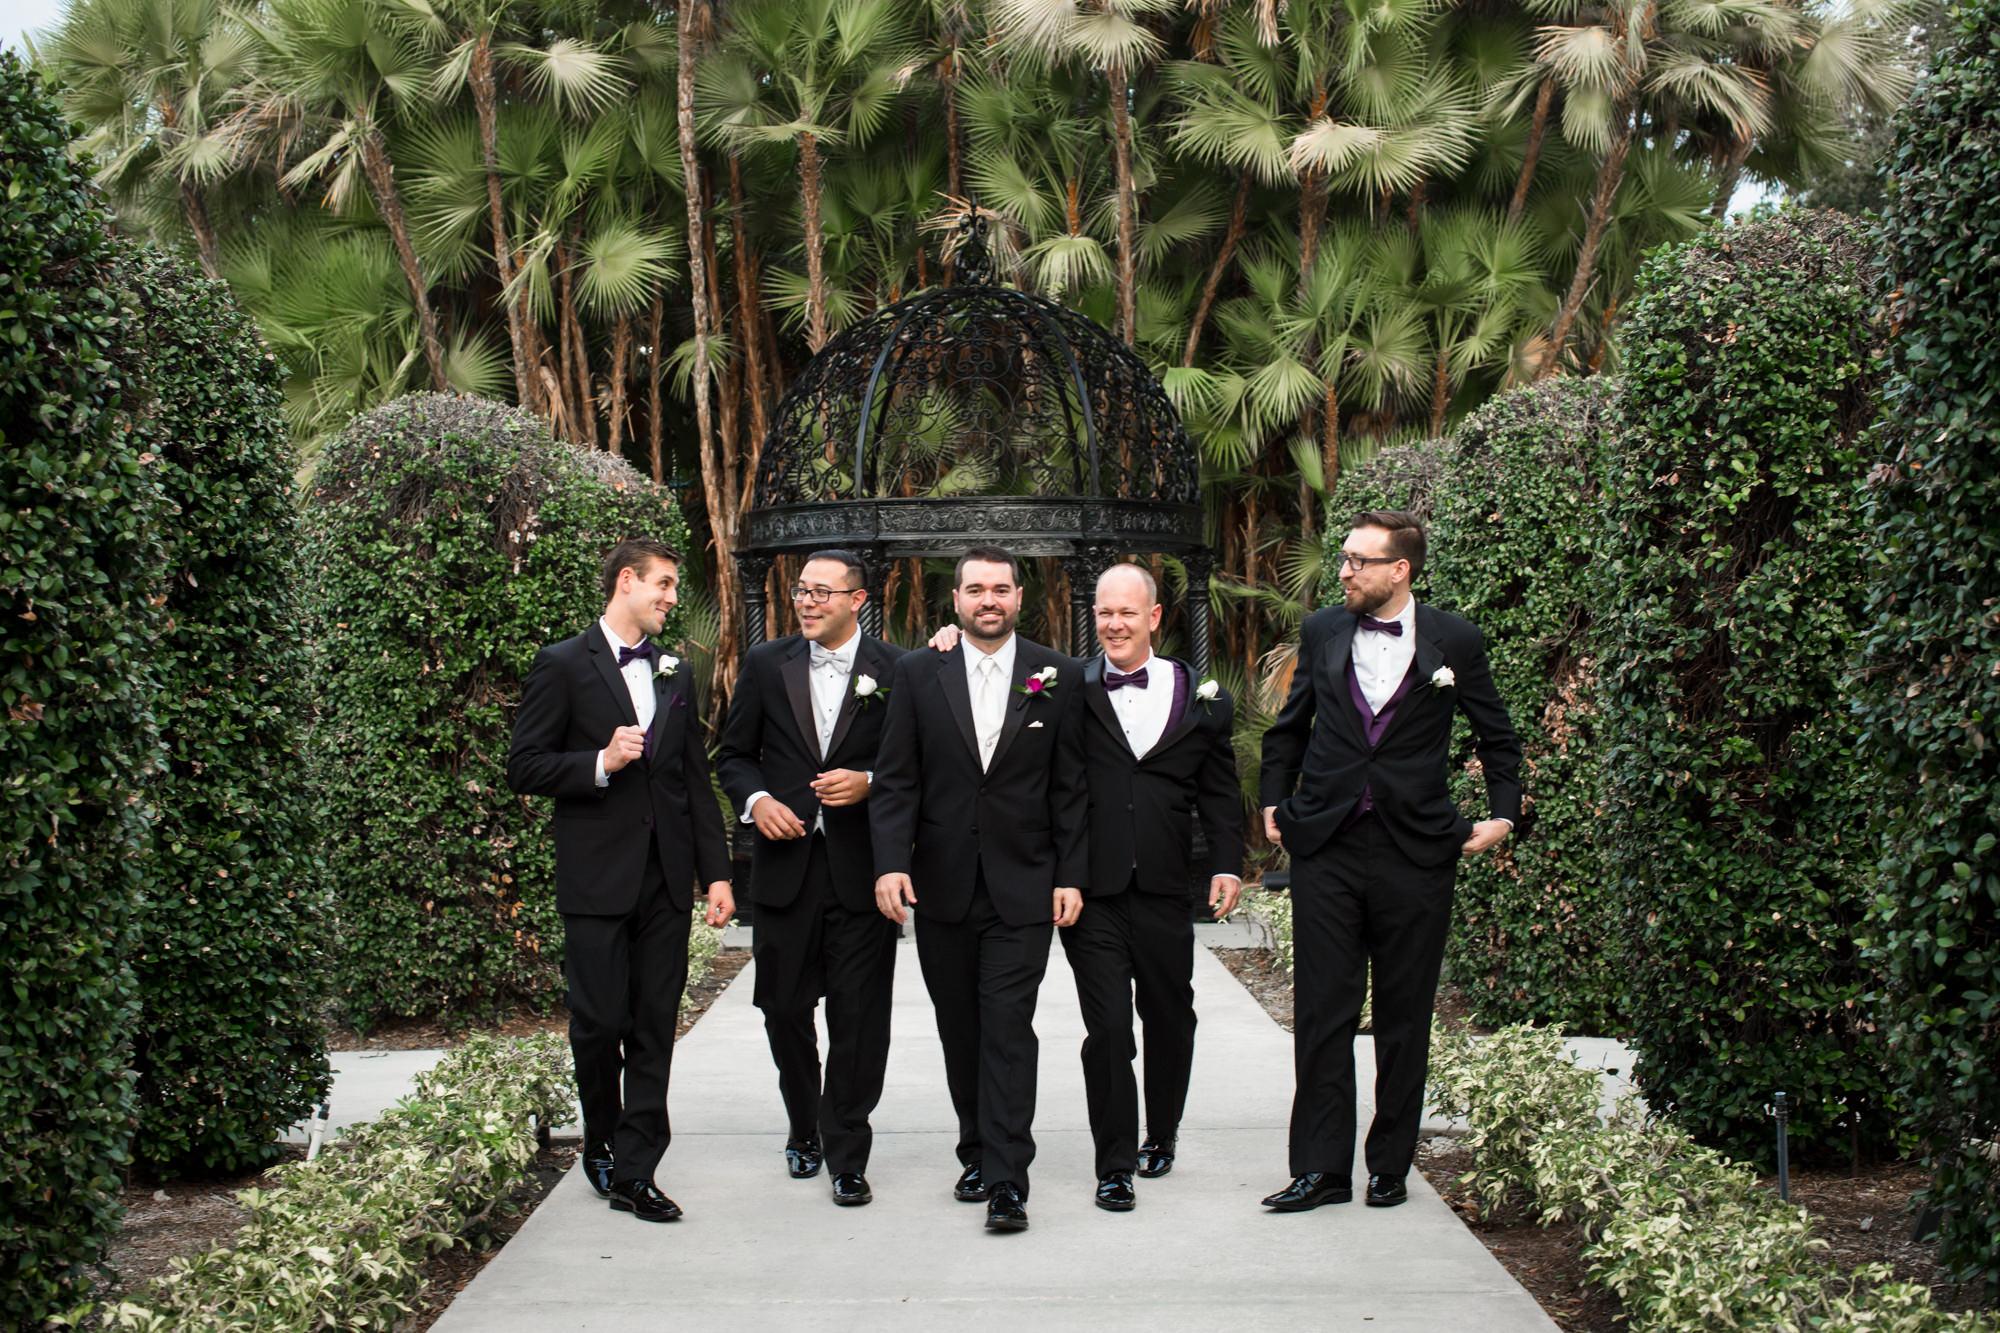 Benvenuto_Wedding_catholic_Florida_Bride-Groom-63.jpg